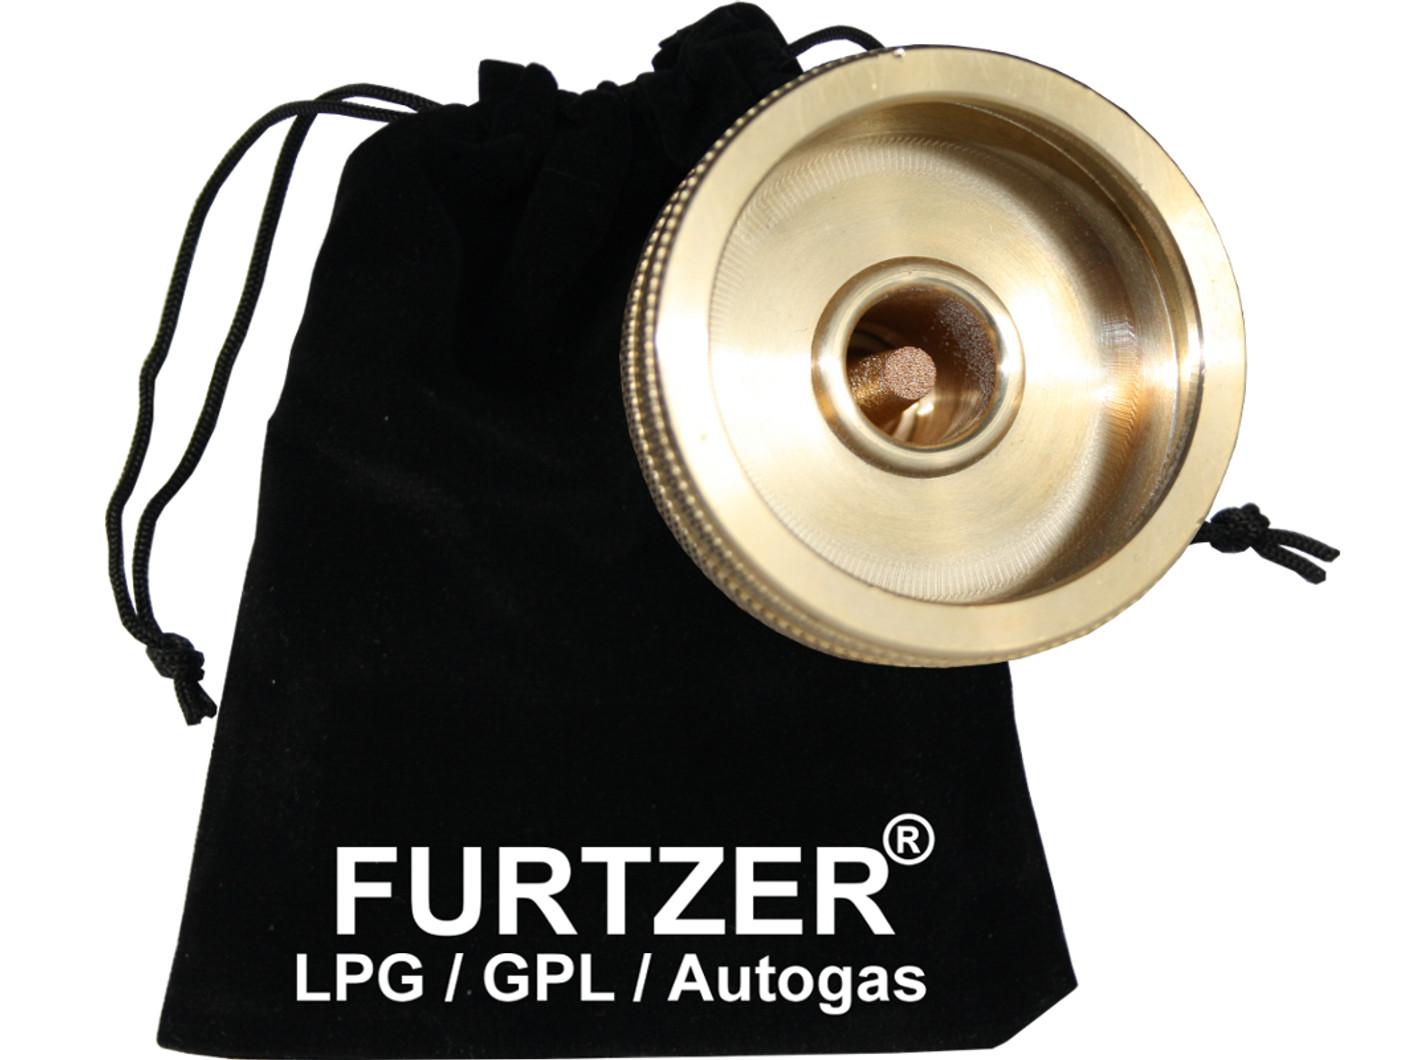 Furtzer/® LPG GPL Autogas Filter 14 mm 1 St/ück Gasfilter 14 mm